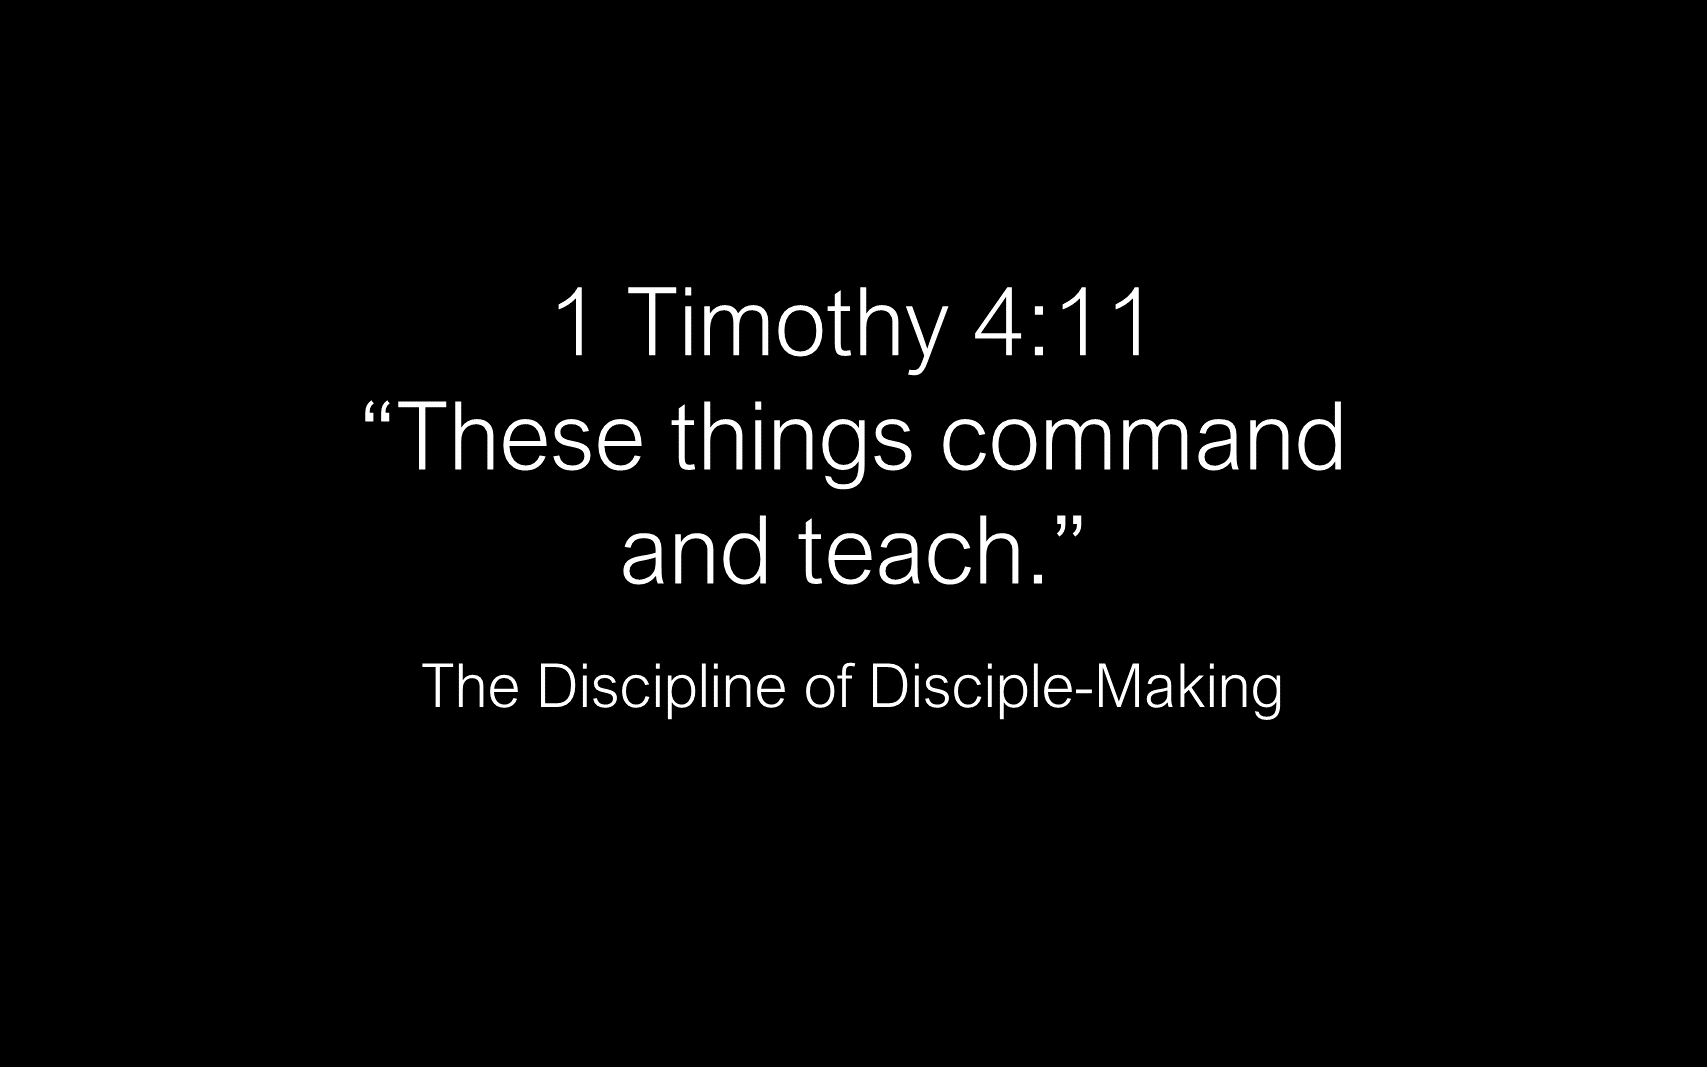 ESH-11 - The Discipline Of Disciple-Making - Disciples - Follow Christ & Make Disciples (21)